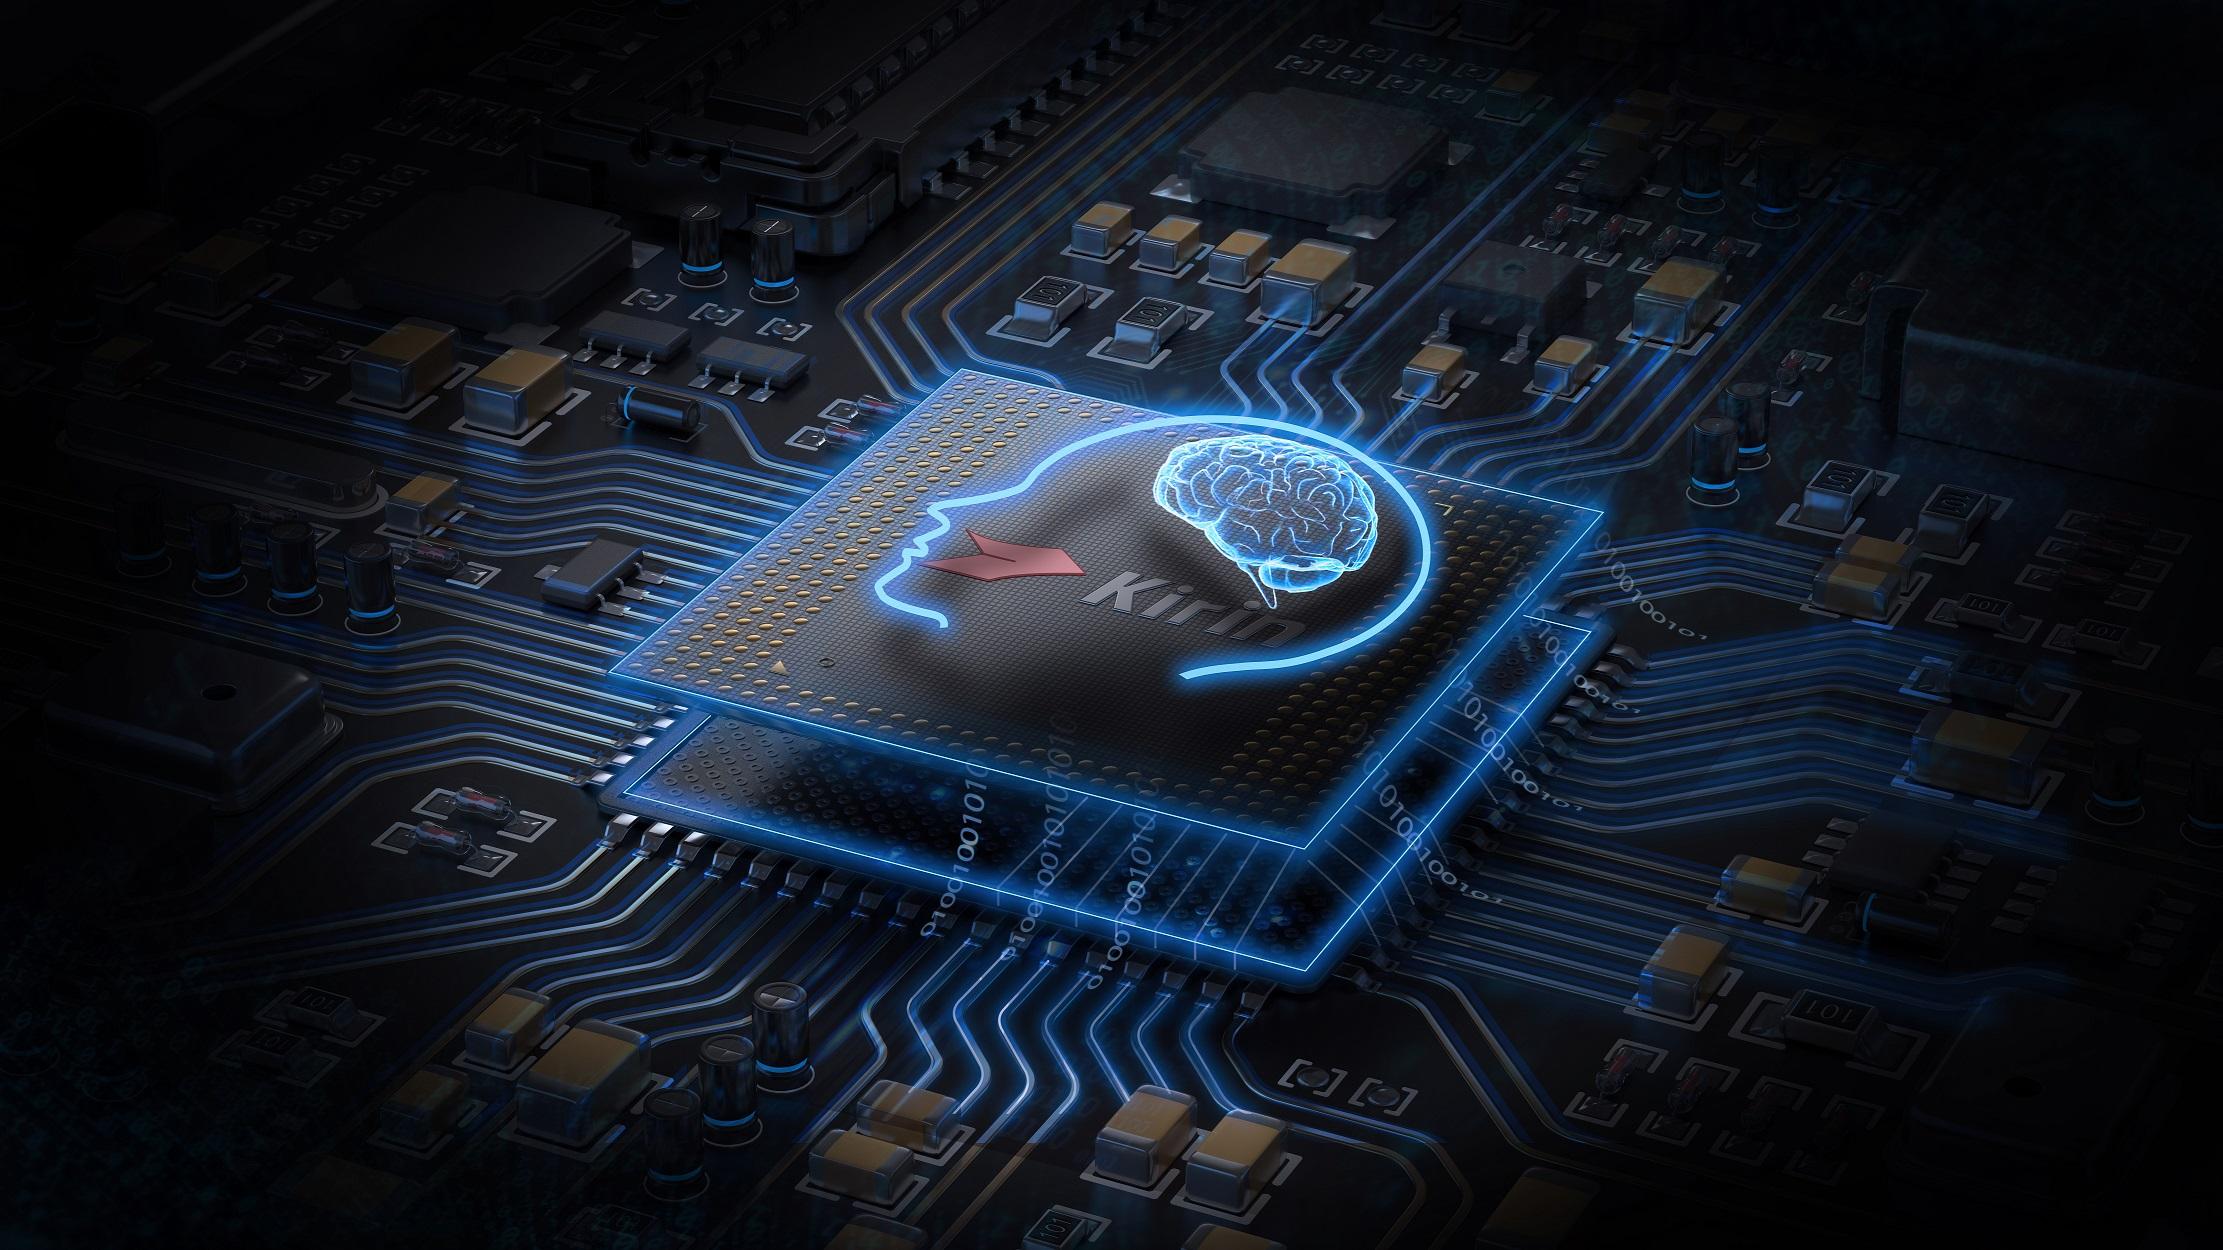 Huawei's first mobile AI computing platform00